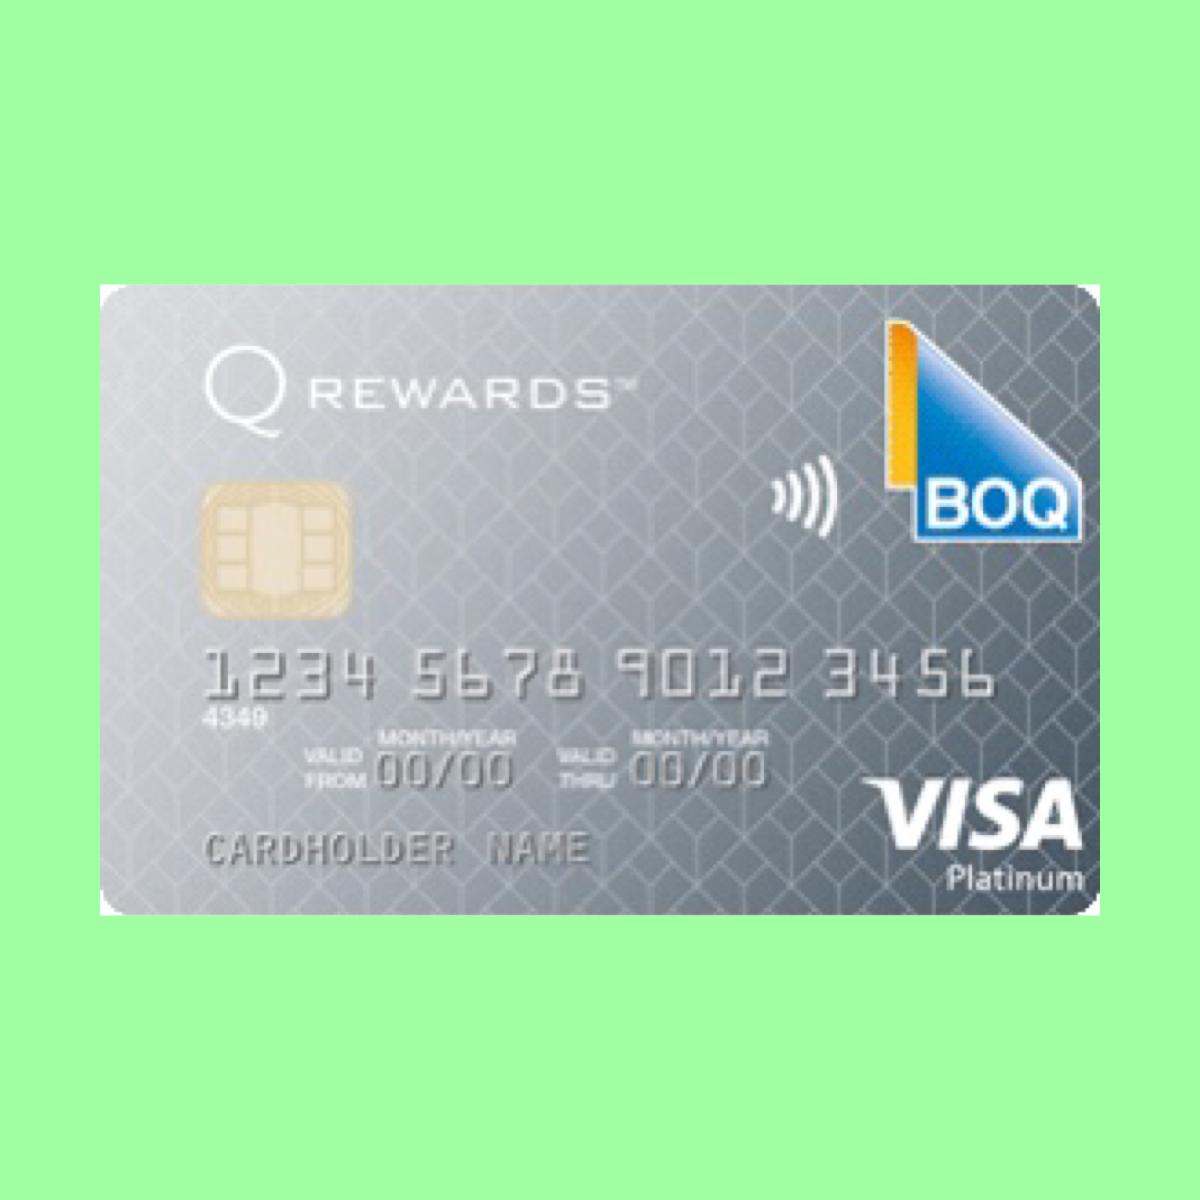 Boq Platinum Visa Credit Card The Point Calculator Visa Platinum Visa Credit Card Visa